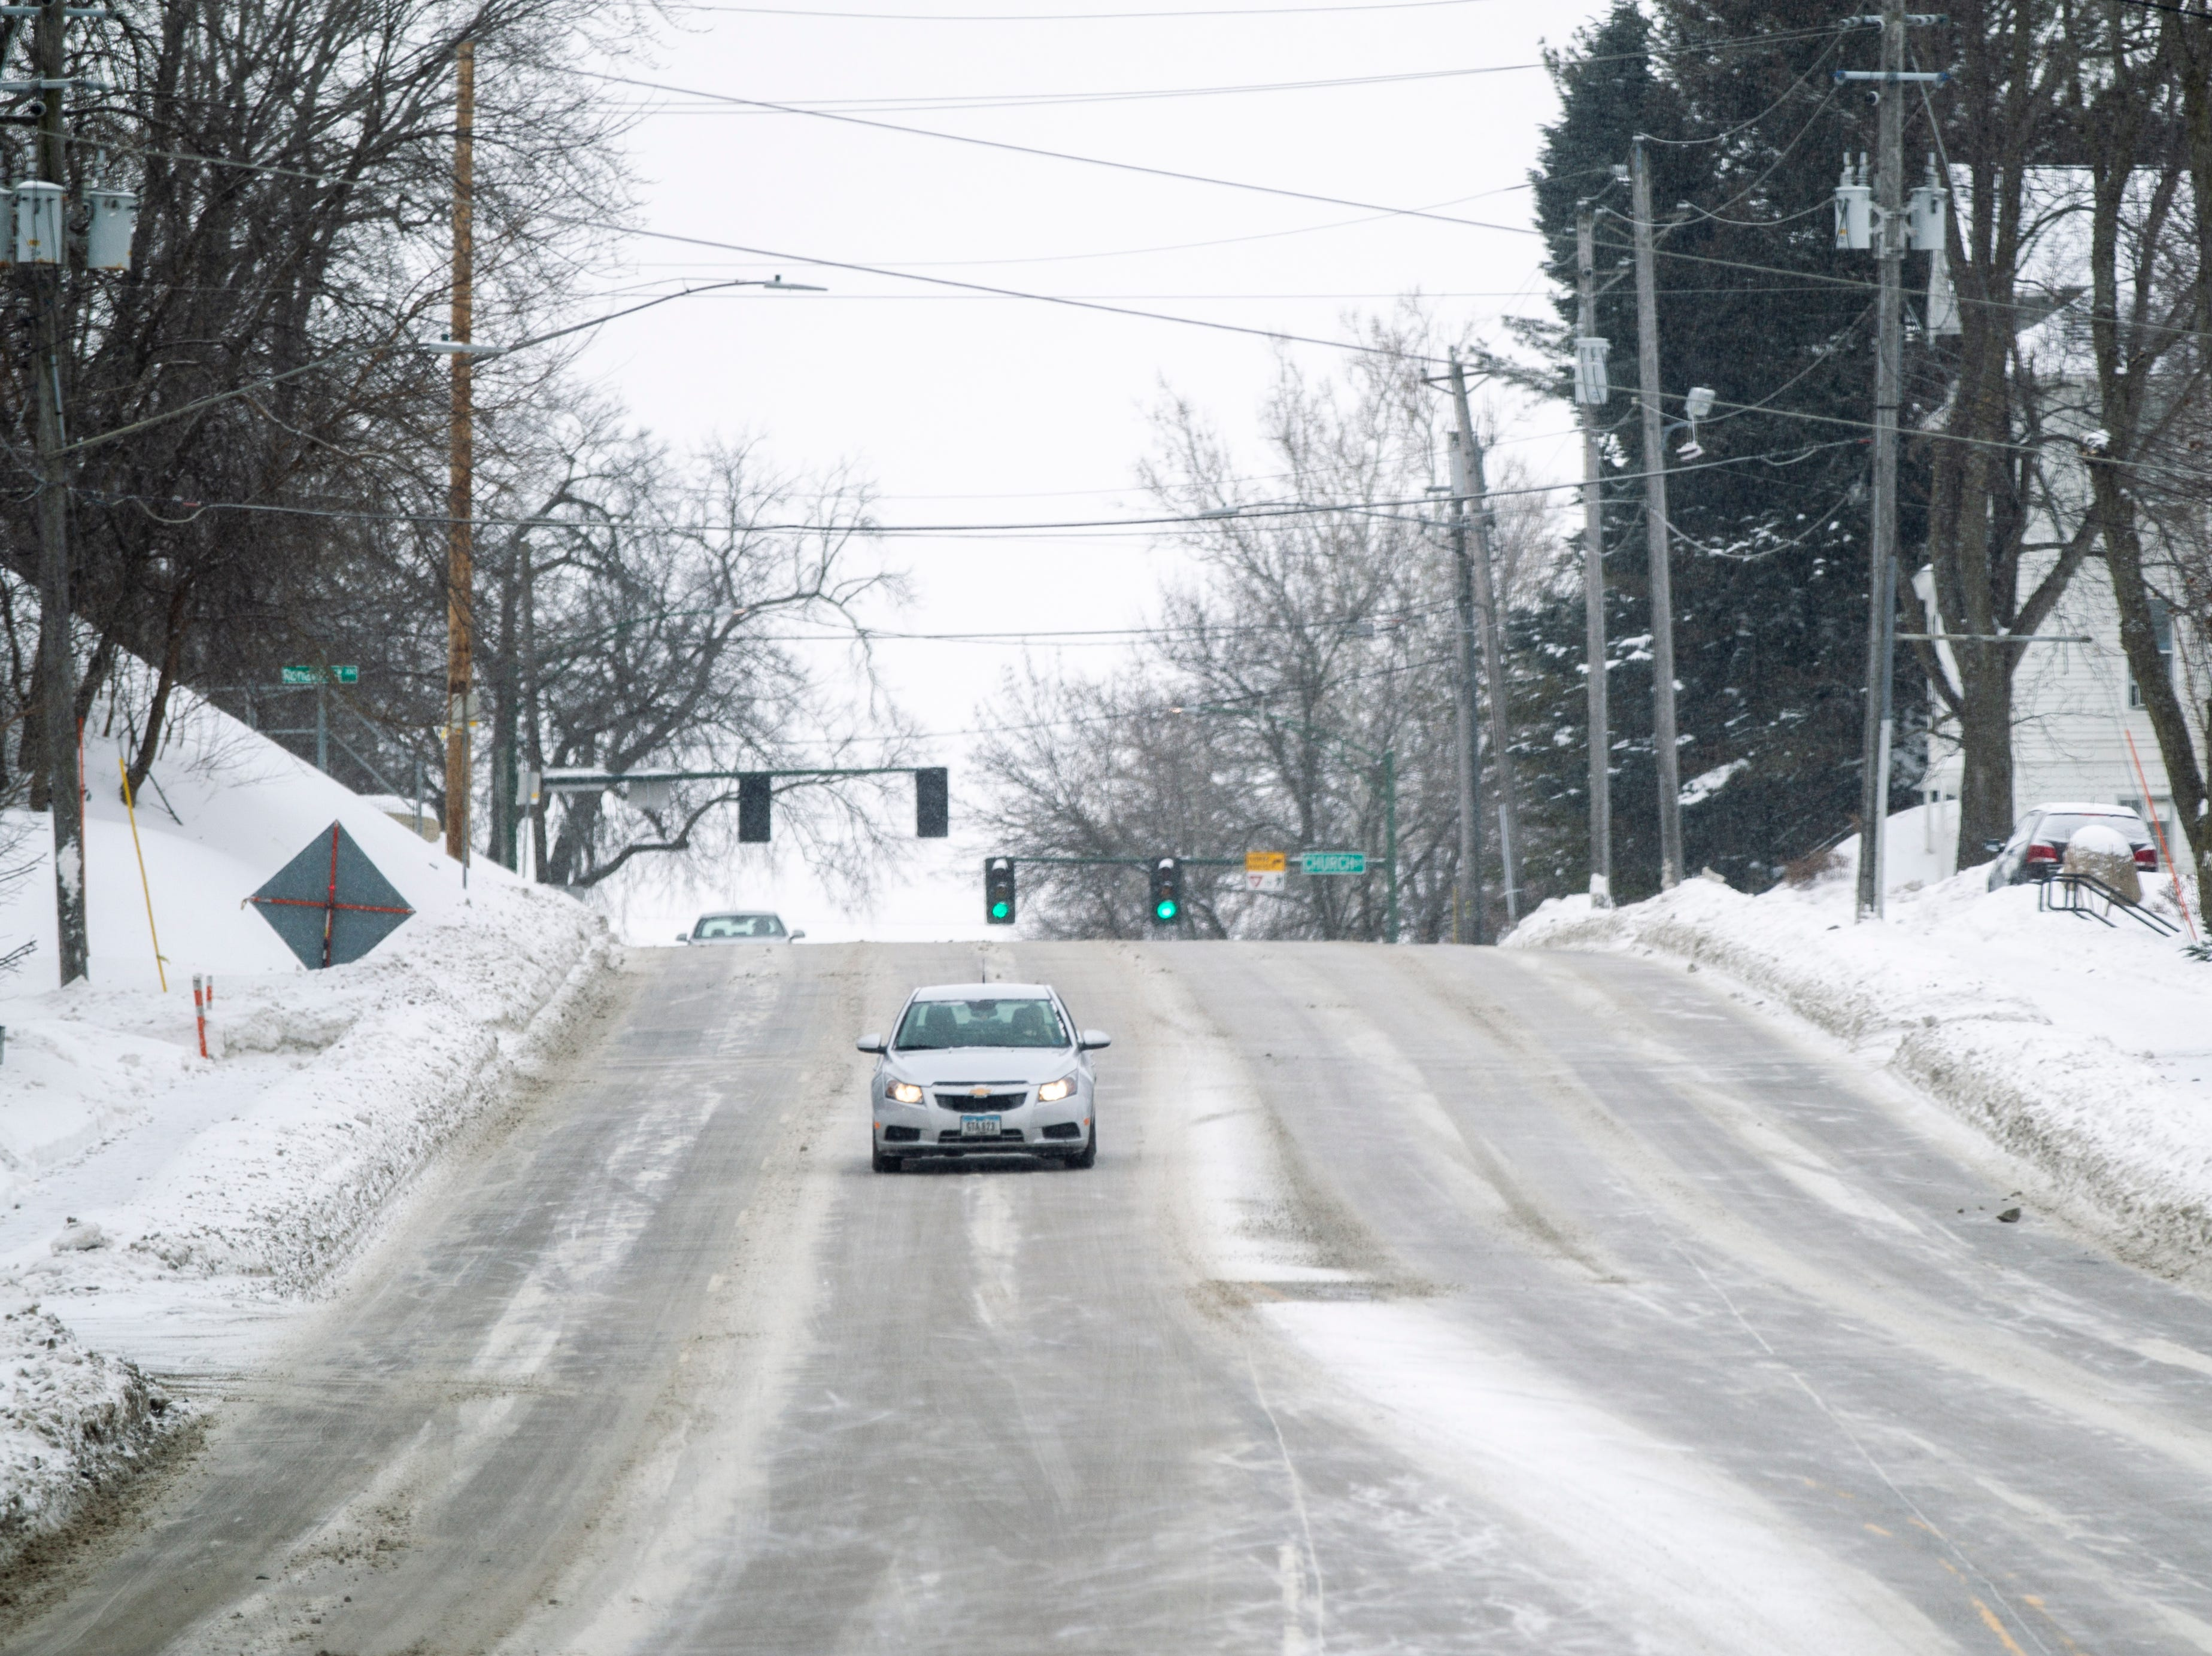 A car drives as snow falls on Thursday, Jan. 31, 2019, along North Dubuque Street in Iowa City, Iowa.